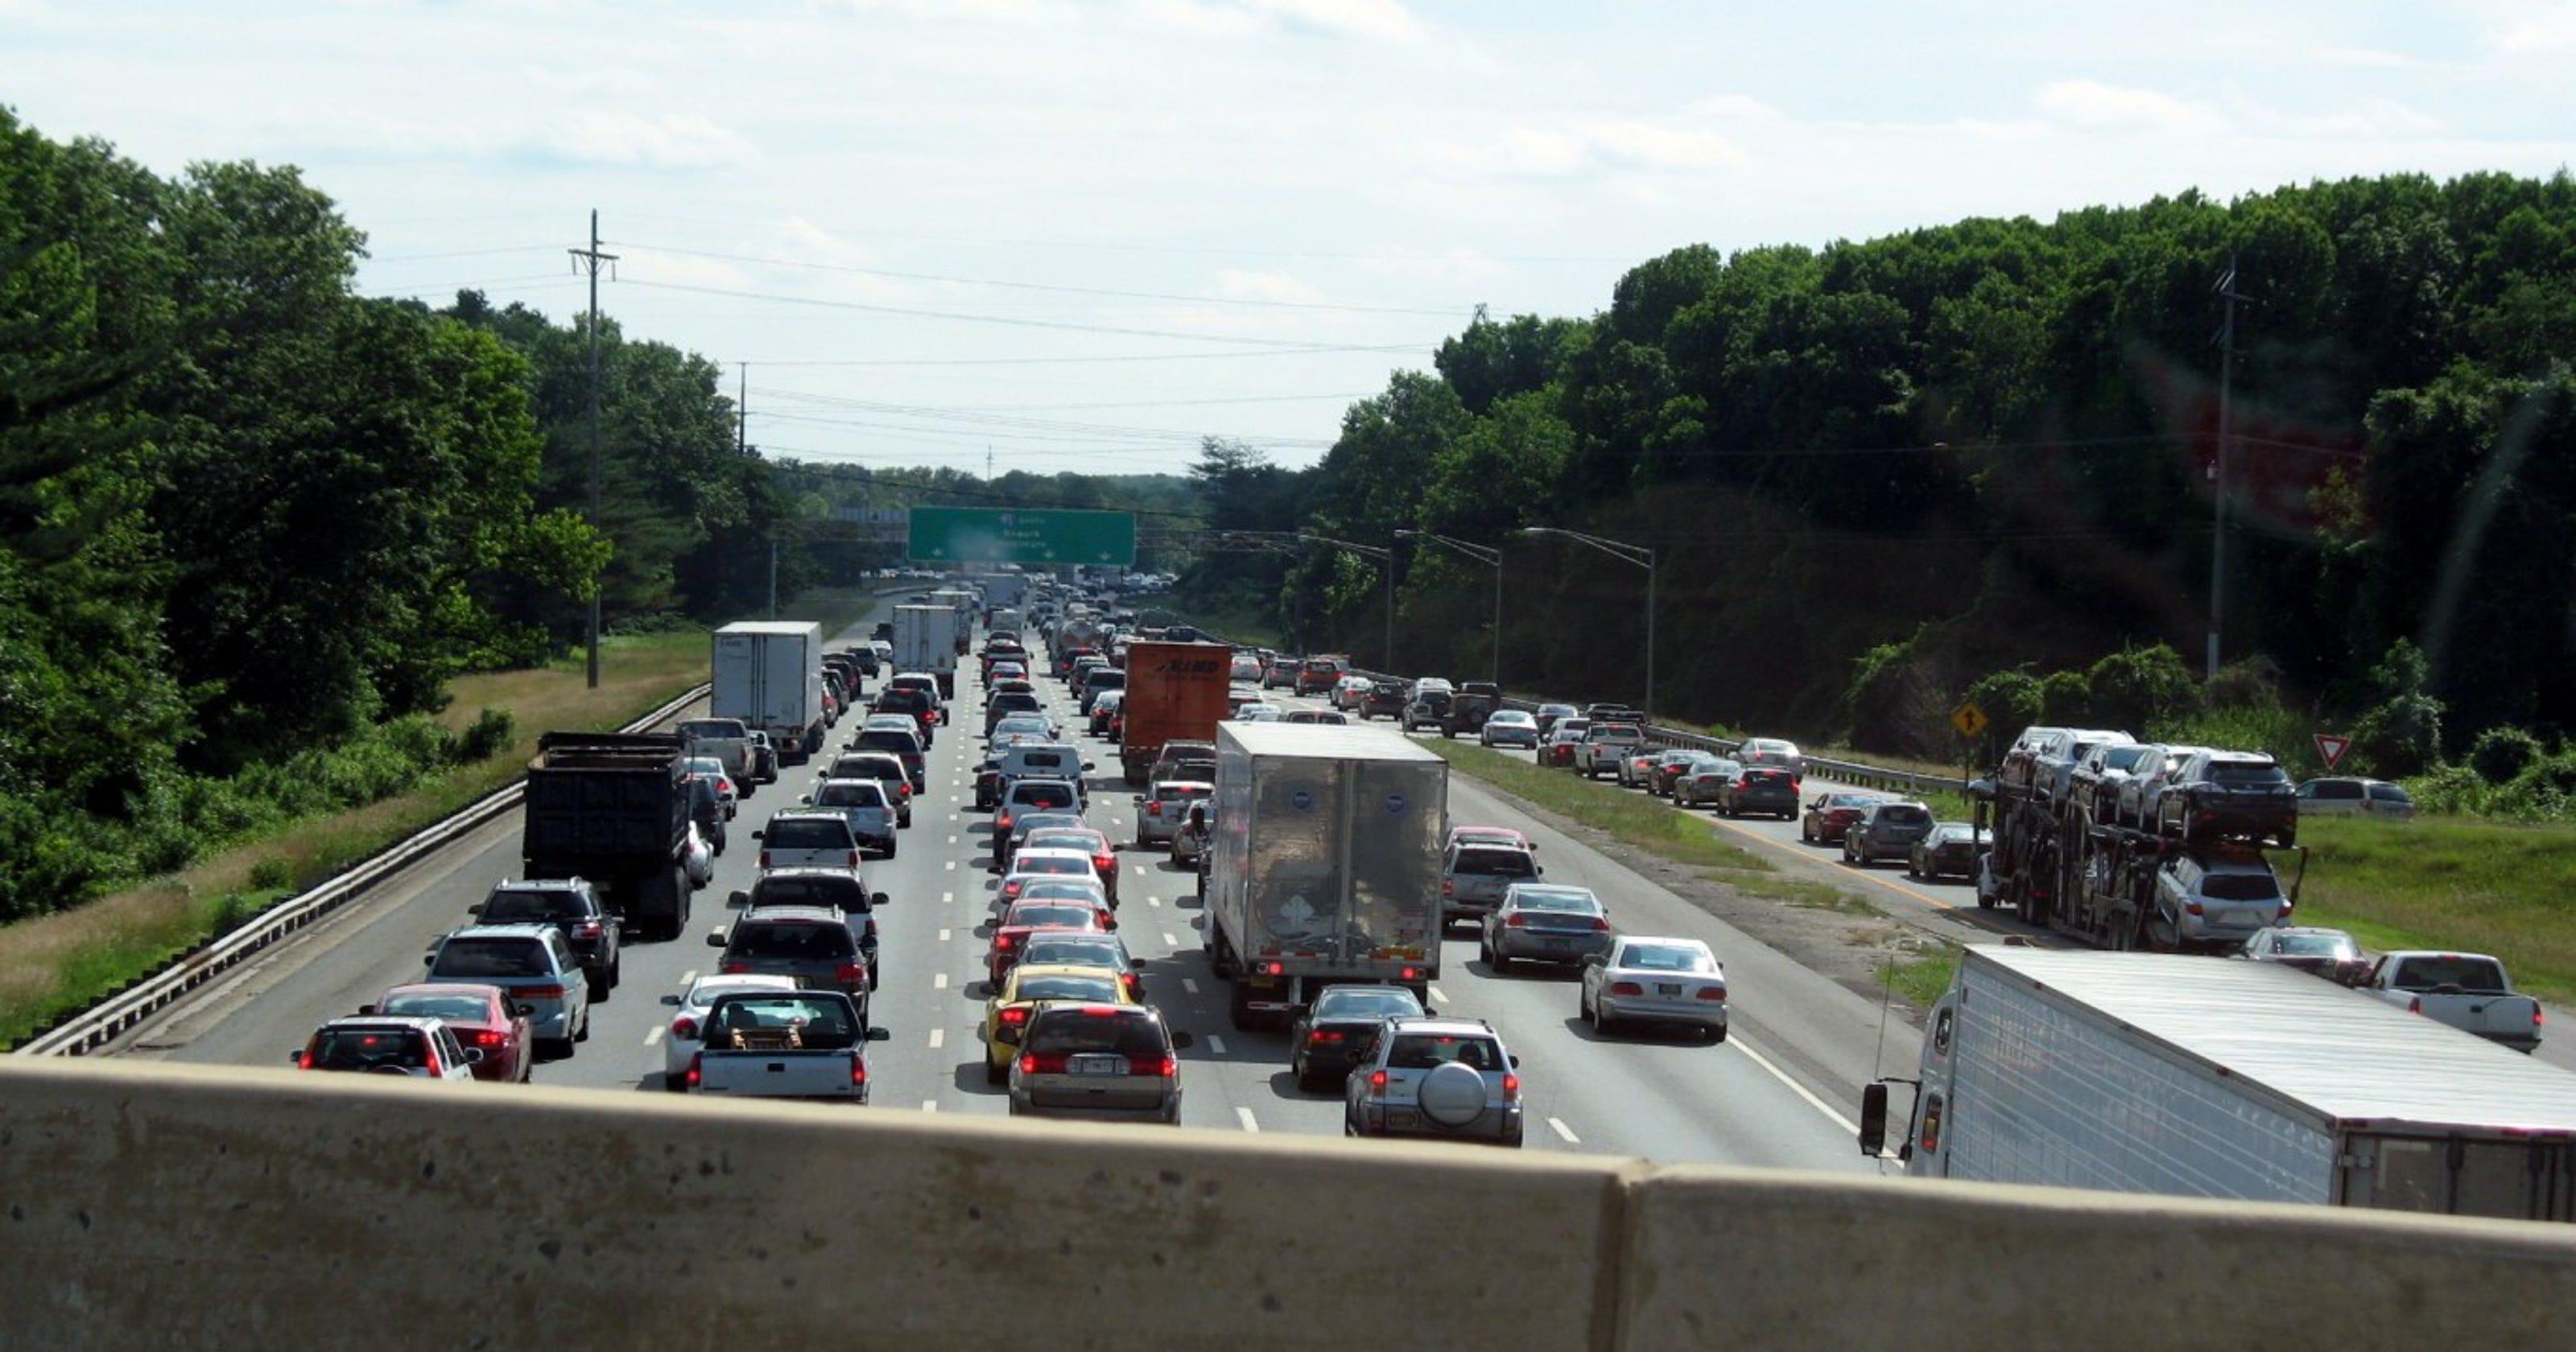 How Self Driving Cars Help Reduce Traffic